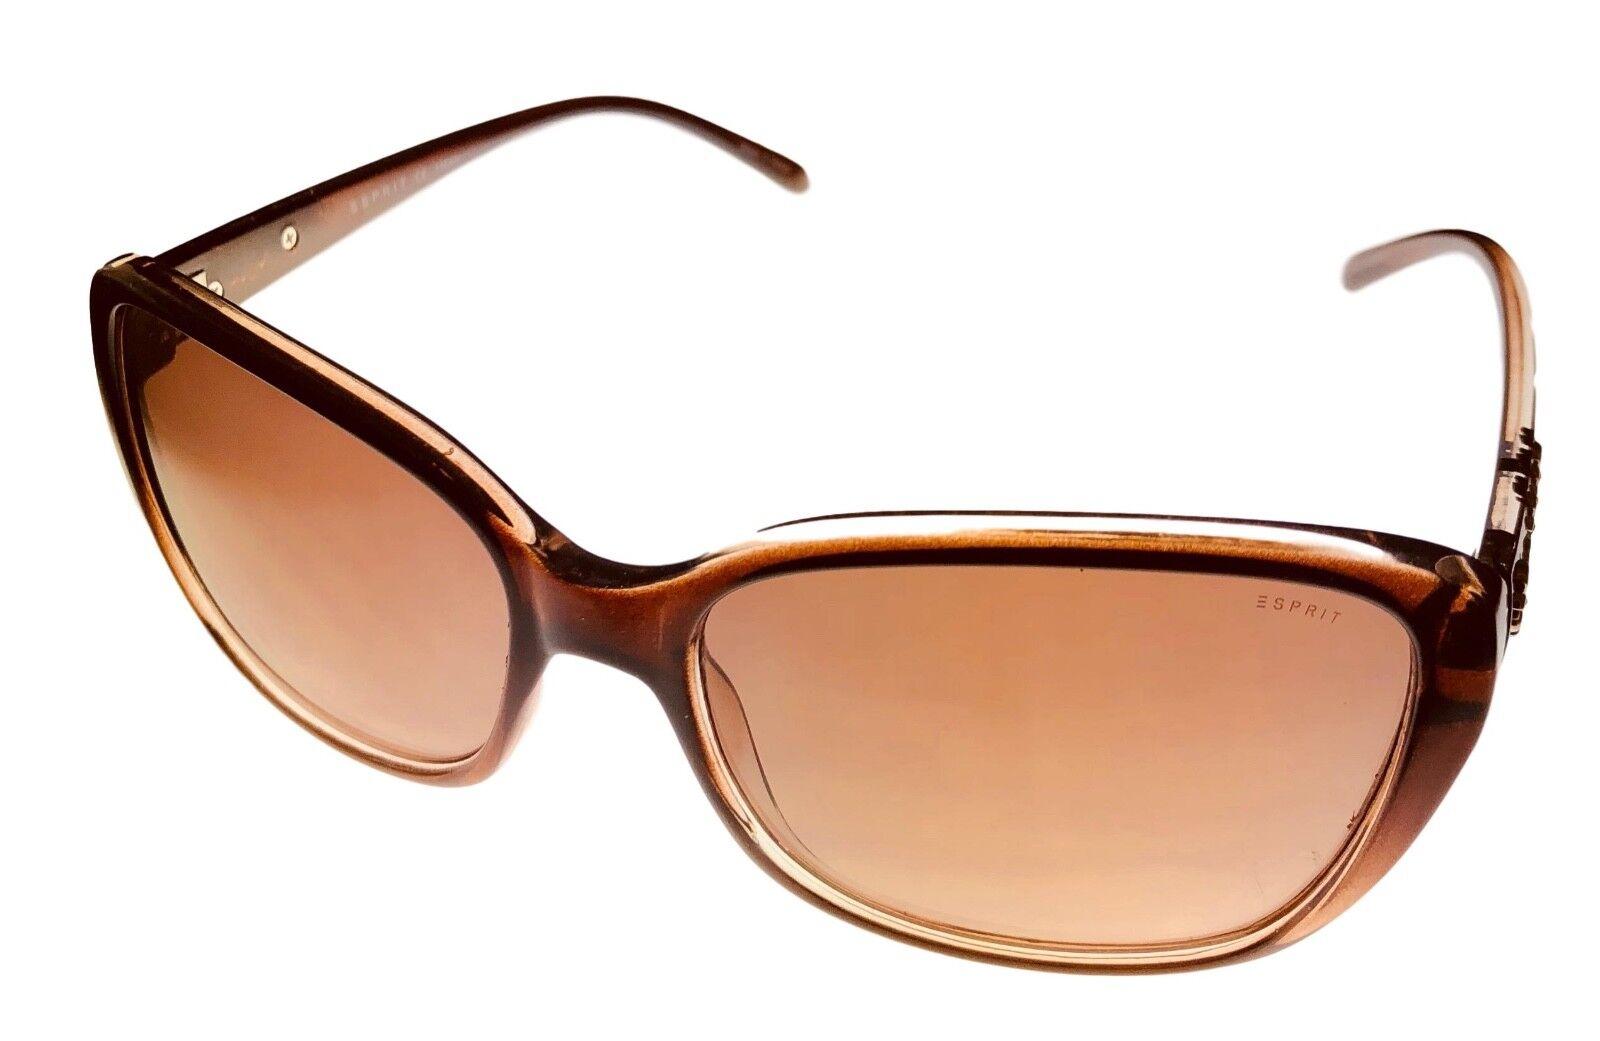 Esprit Sunglass Womens Crystal Brown Plastic Rectangle Sunglass ET19450. 535